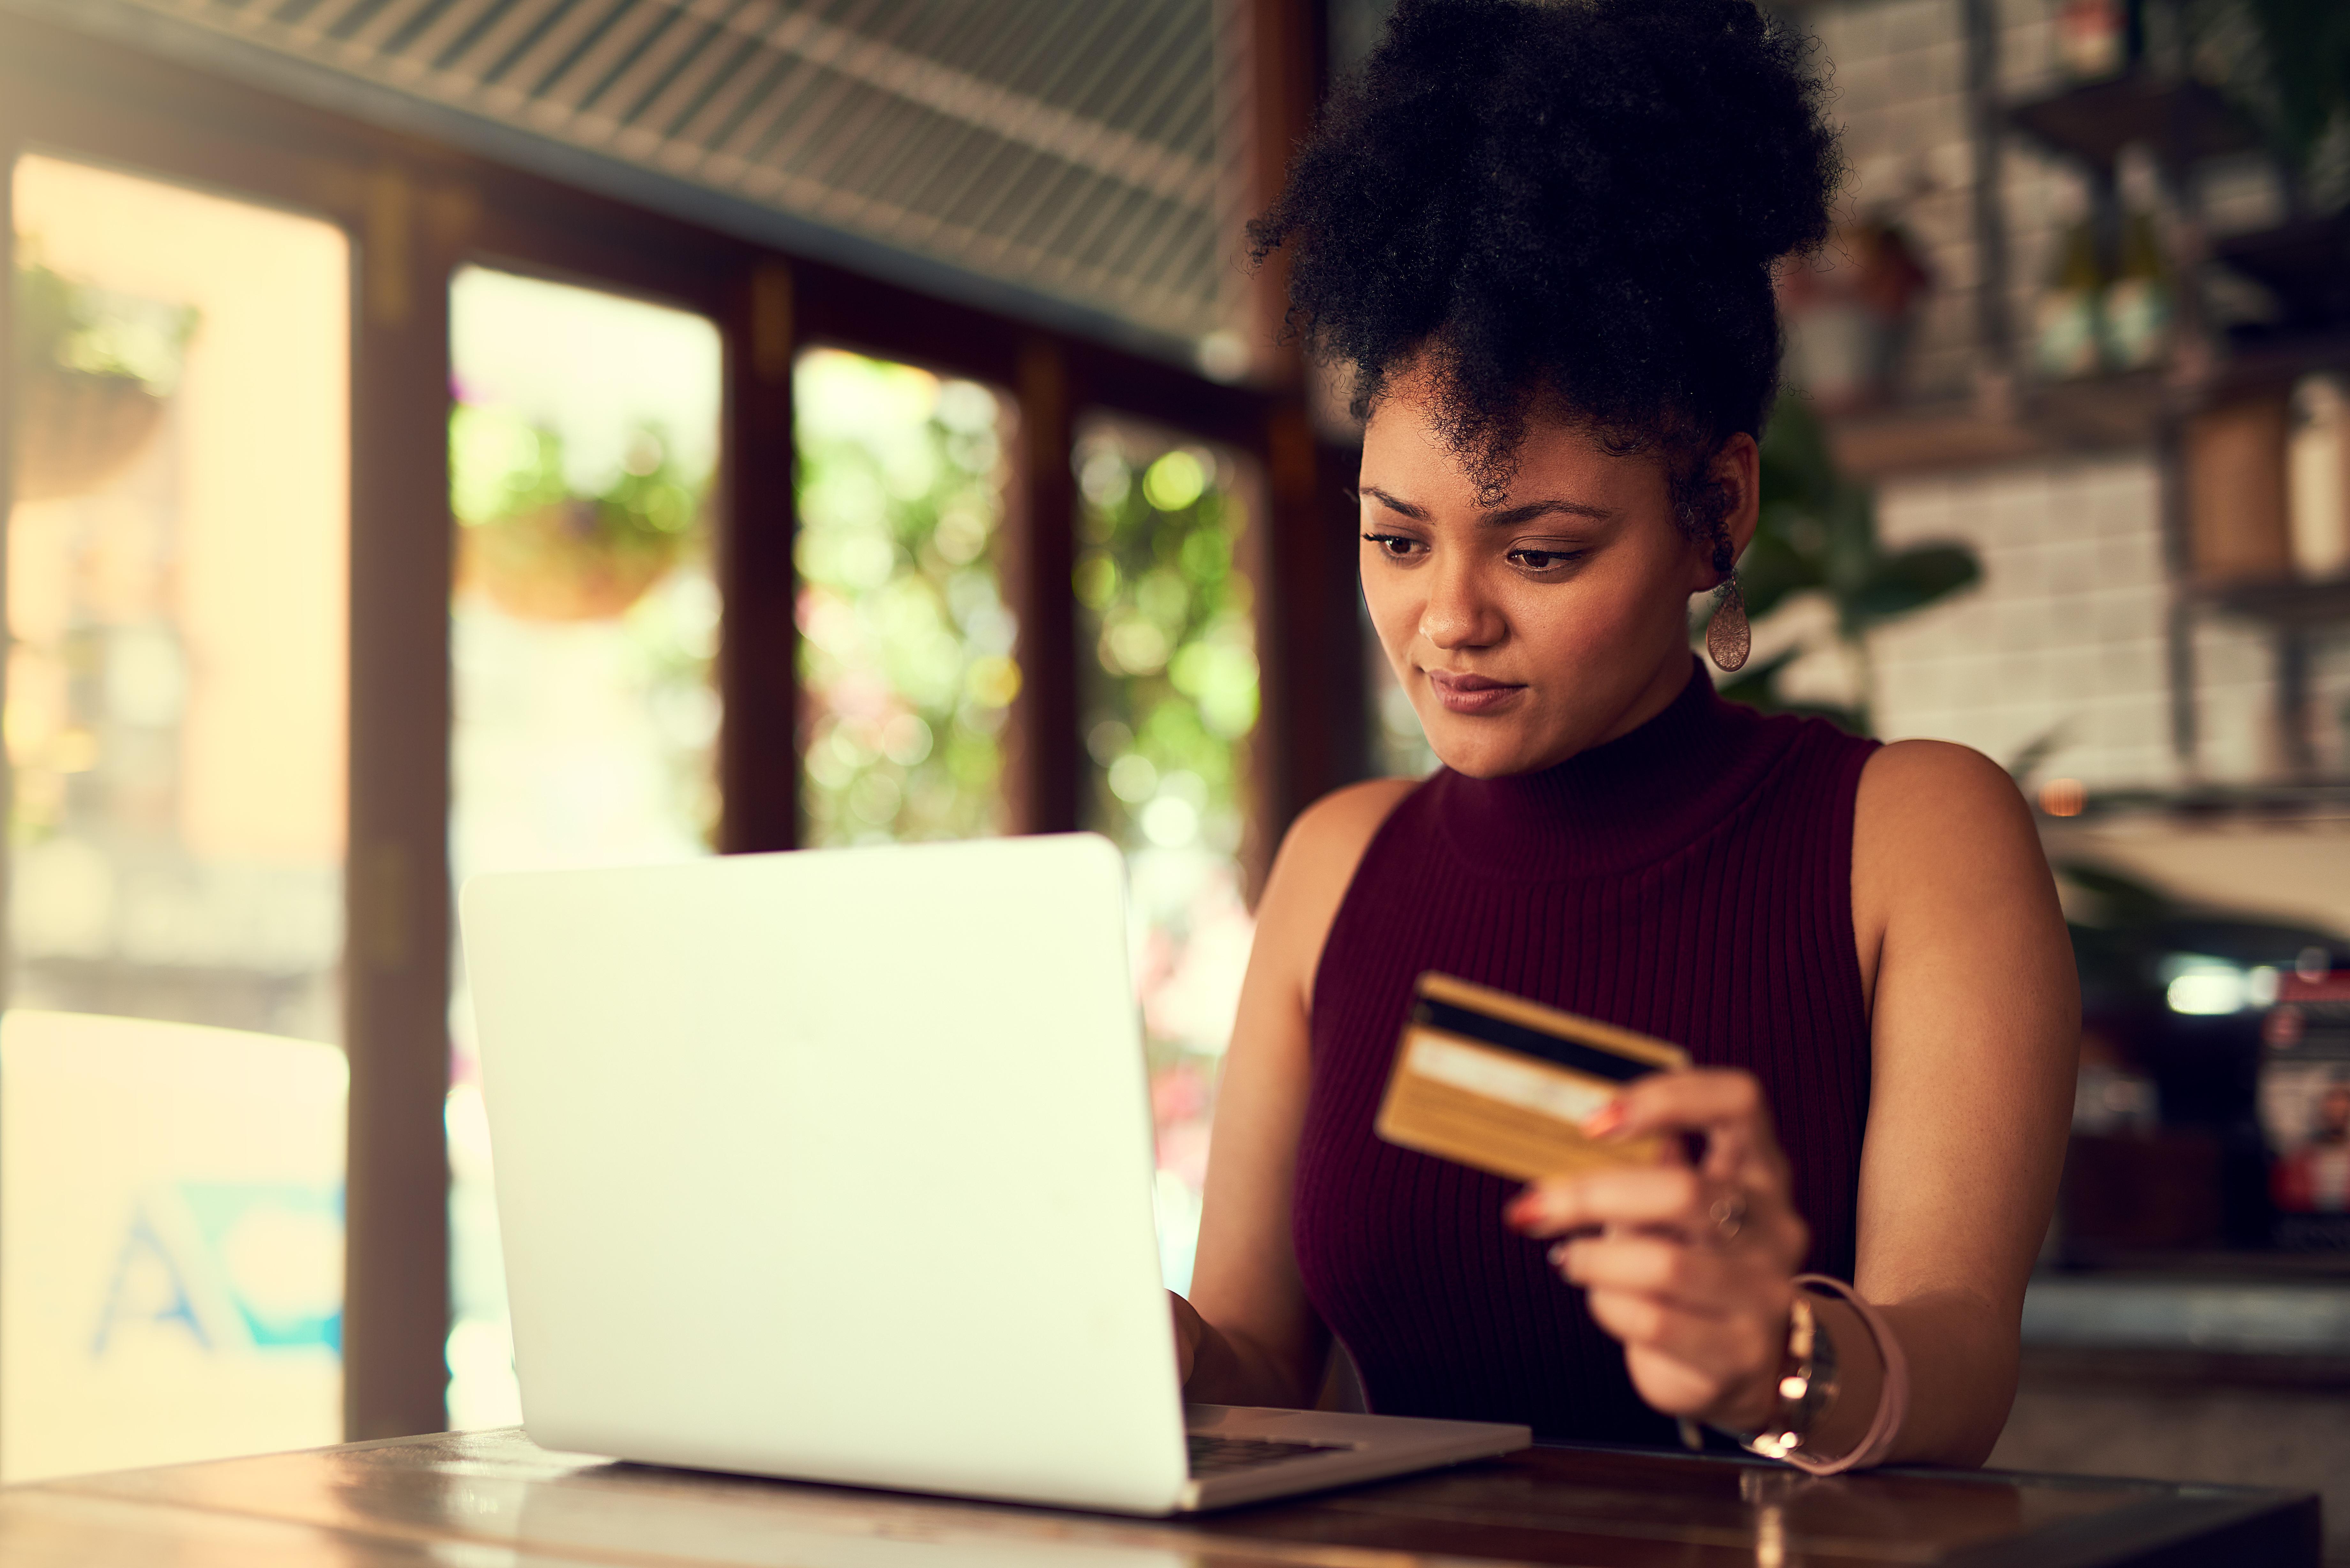 Scoring on some big deals online